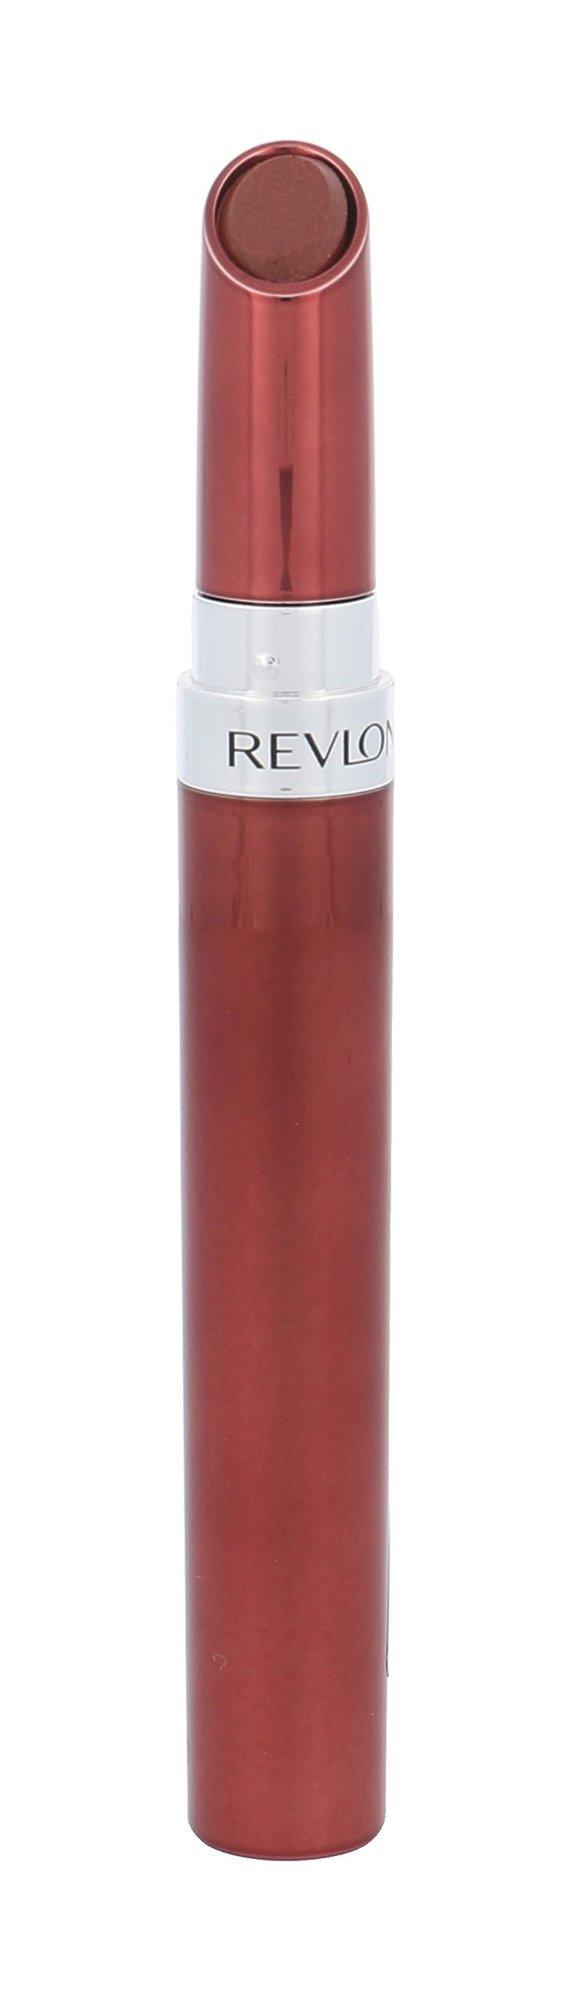 Revlon Ultra HD Cosmetic 1,7ml 715 HD Arabica